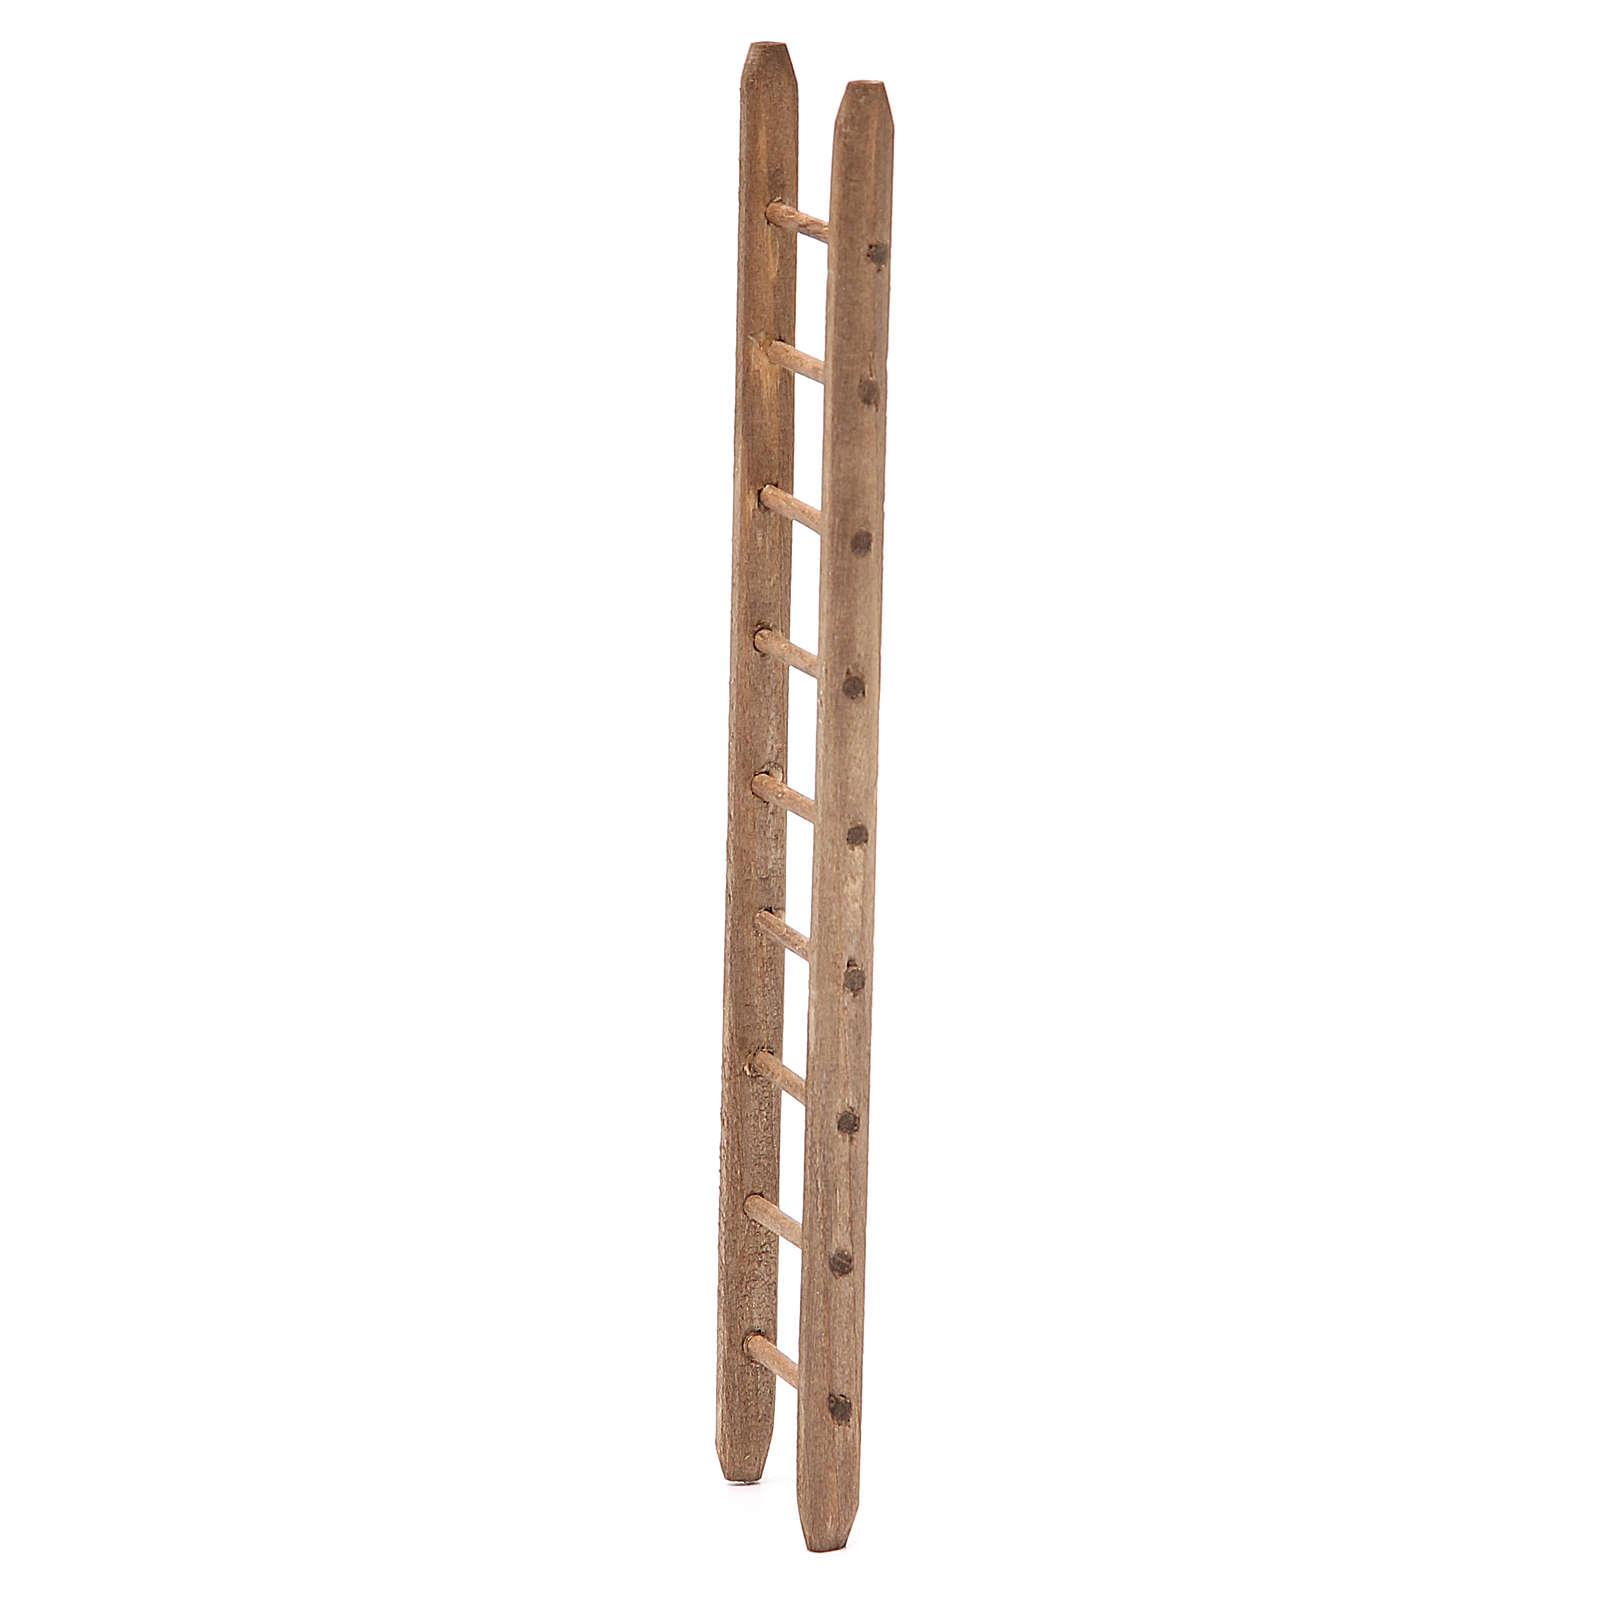 Escalera de madera oscura para belén h. 18x4 cm 4